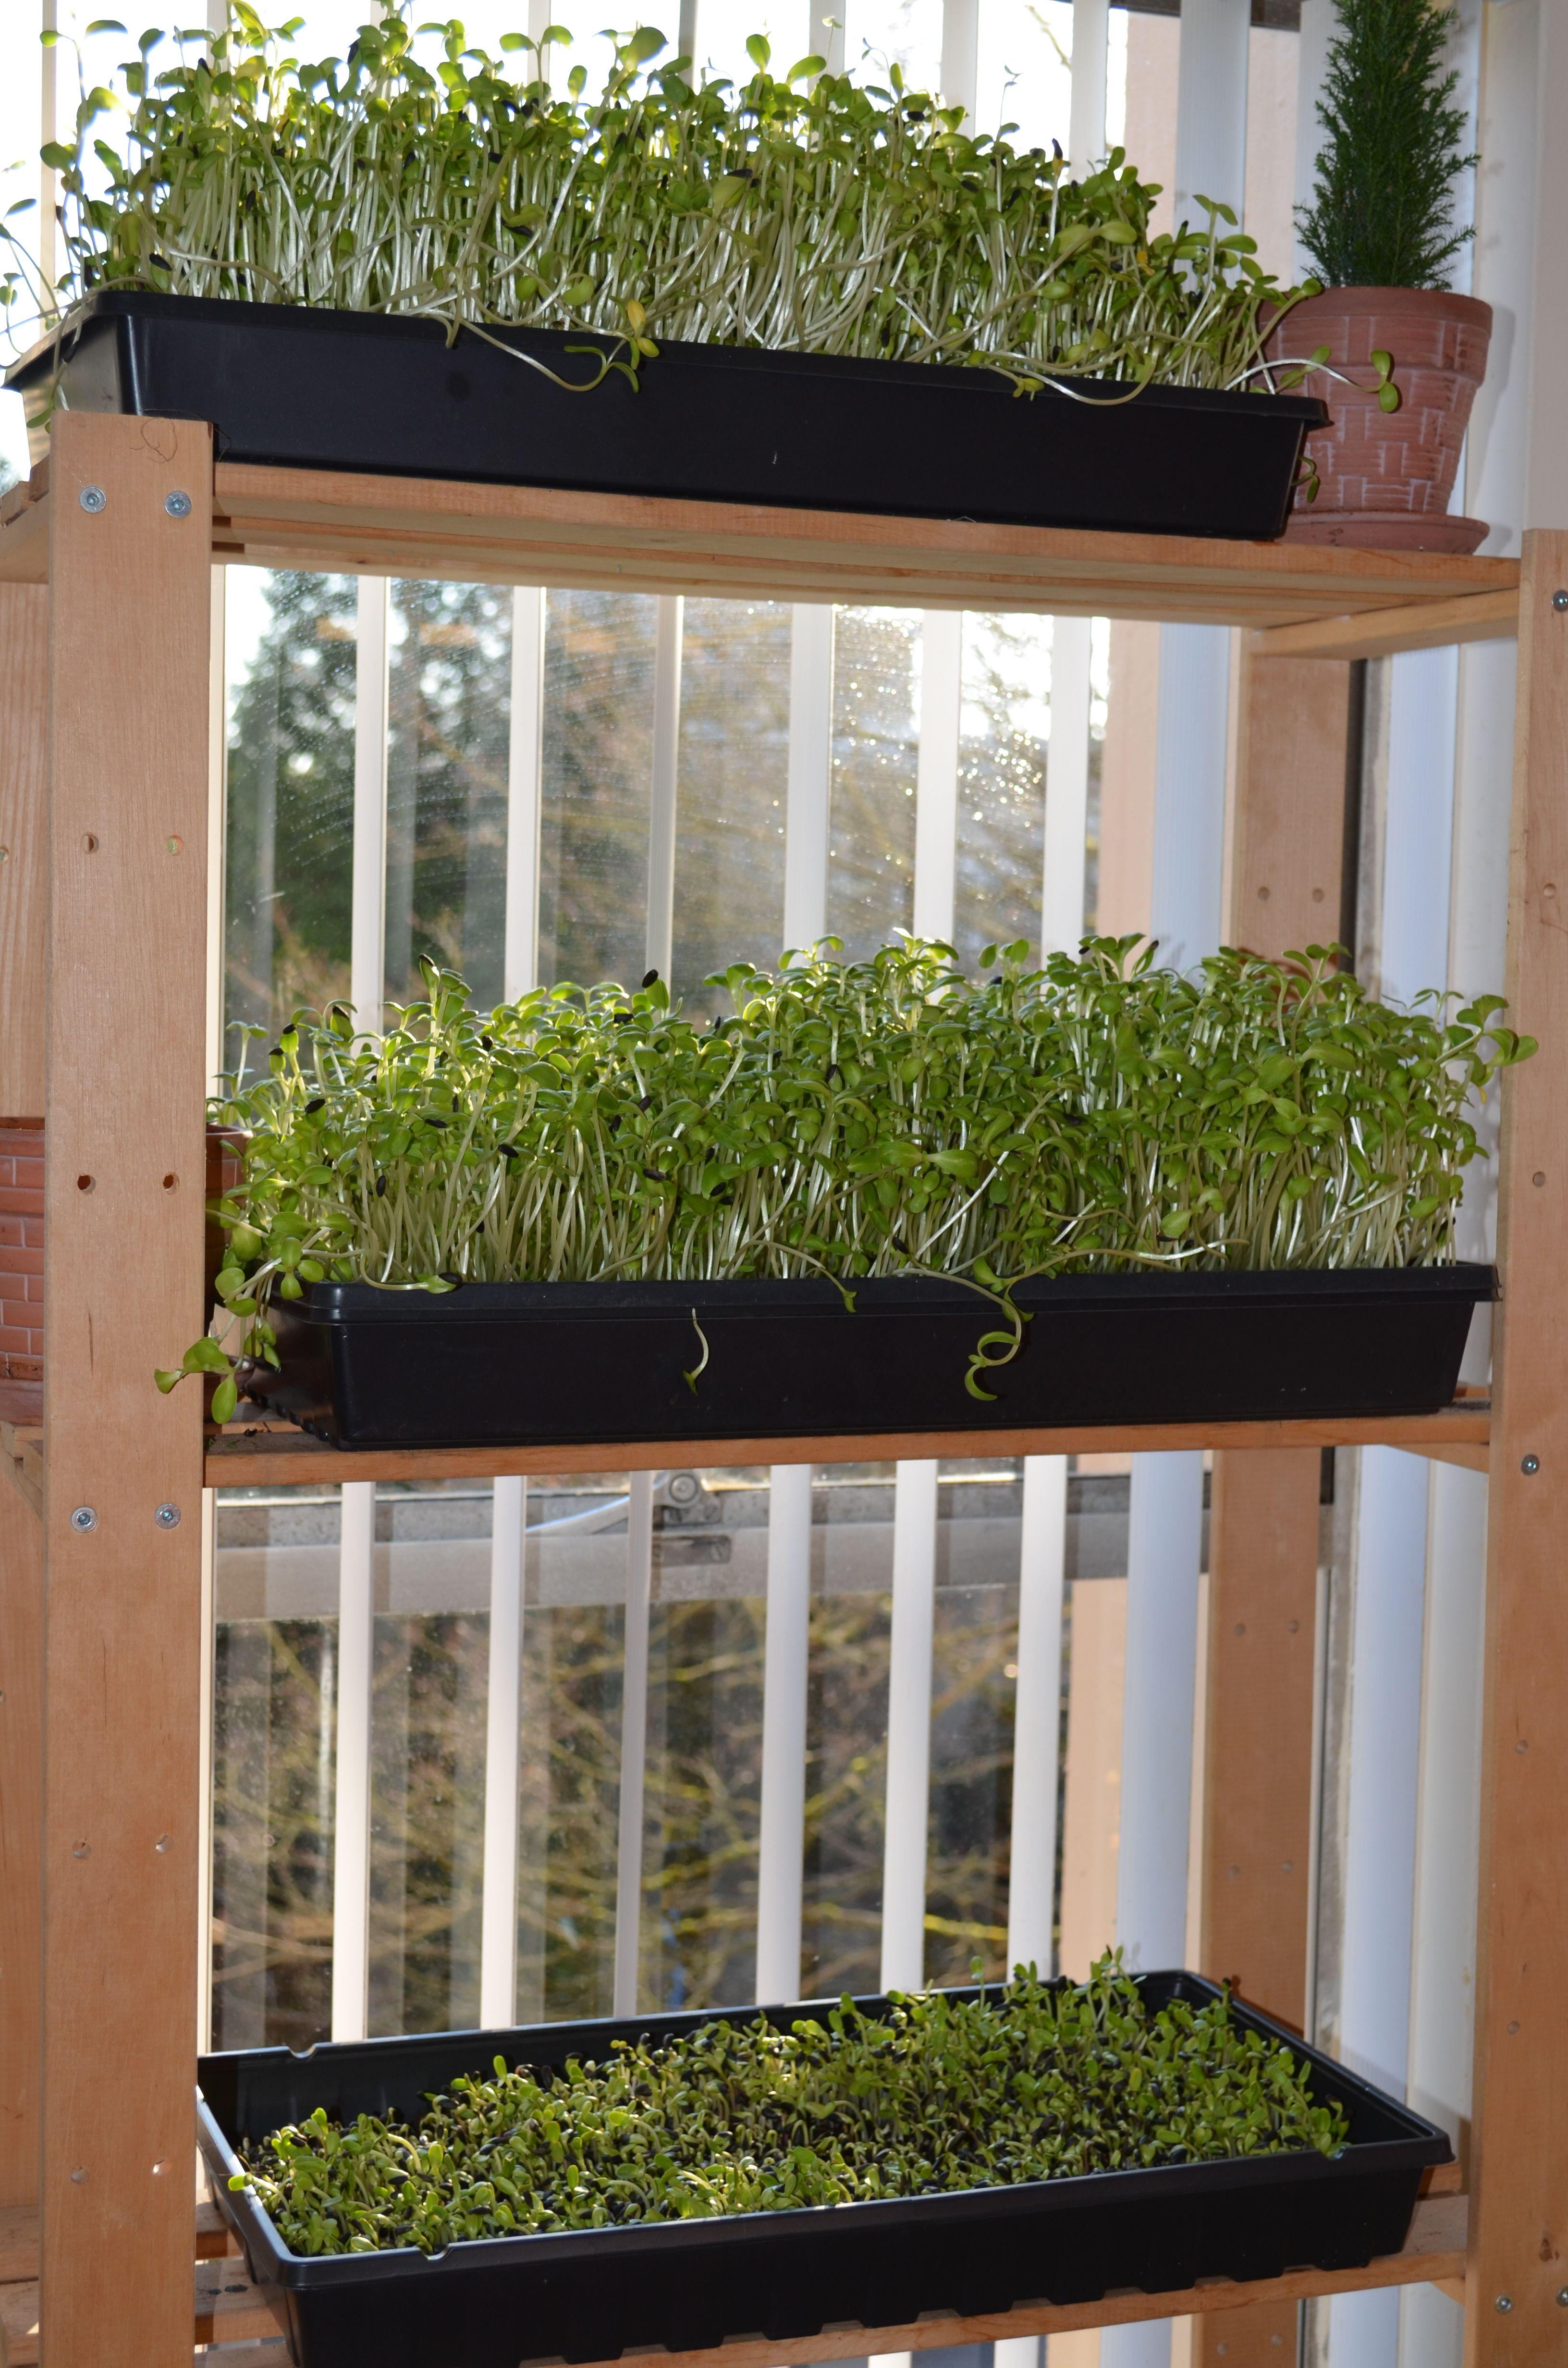 chantale roy jardinage urbain int rieur cultiver des. Black Bedroom Furniture Sets. Home Design Ideas